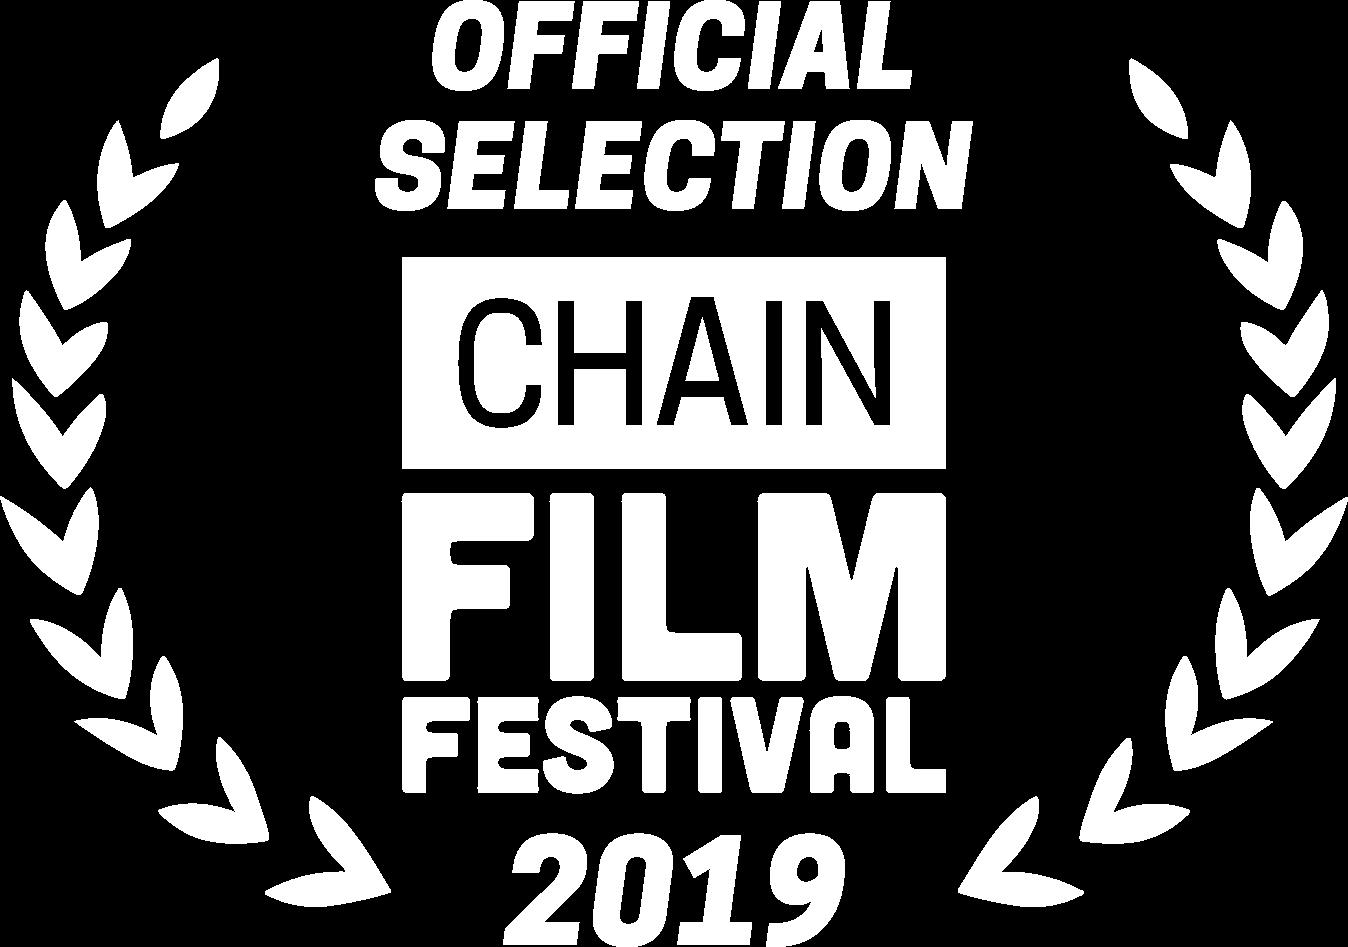 CFF-2019-laurel-white.png